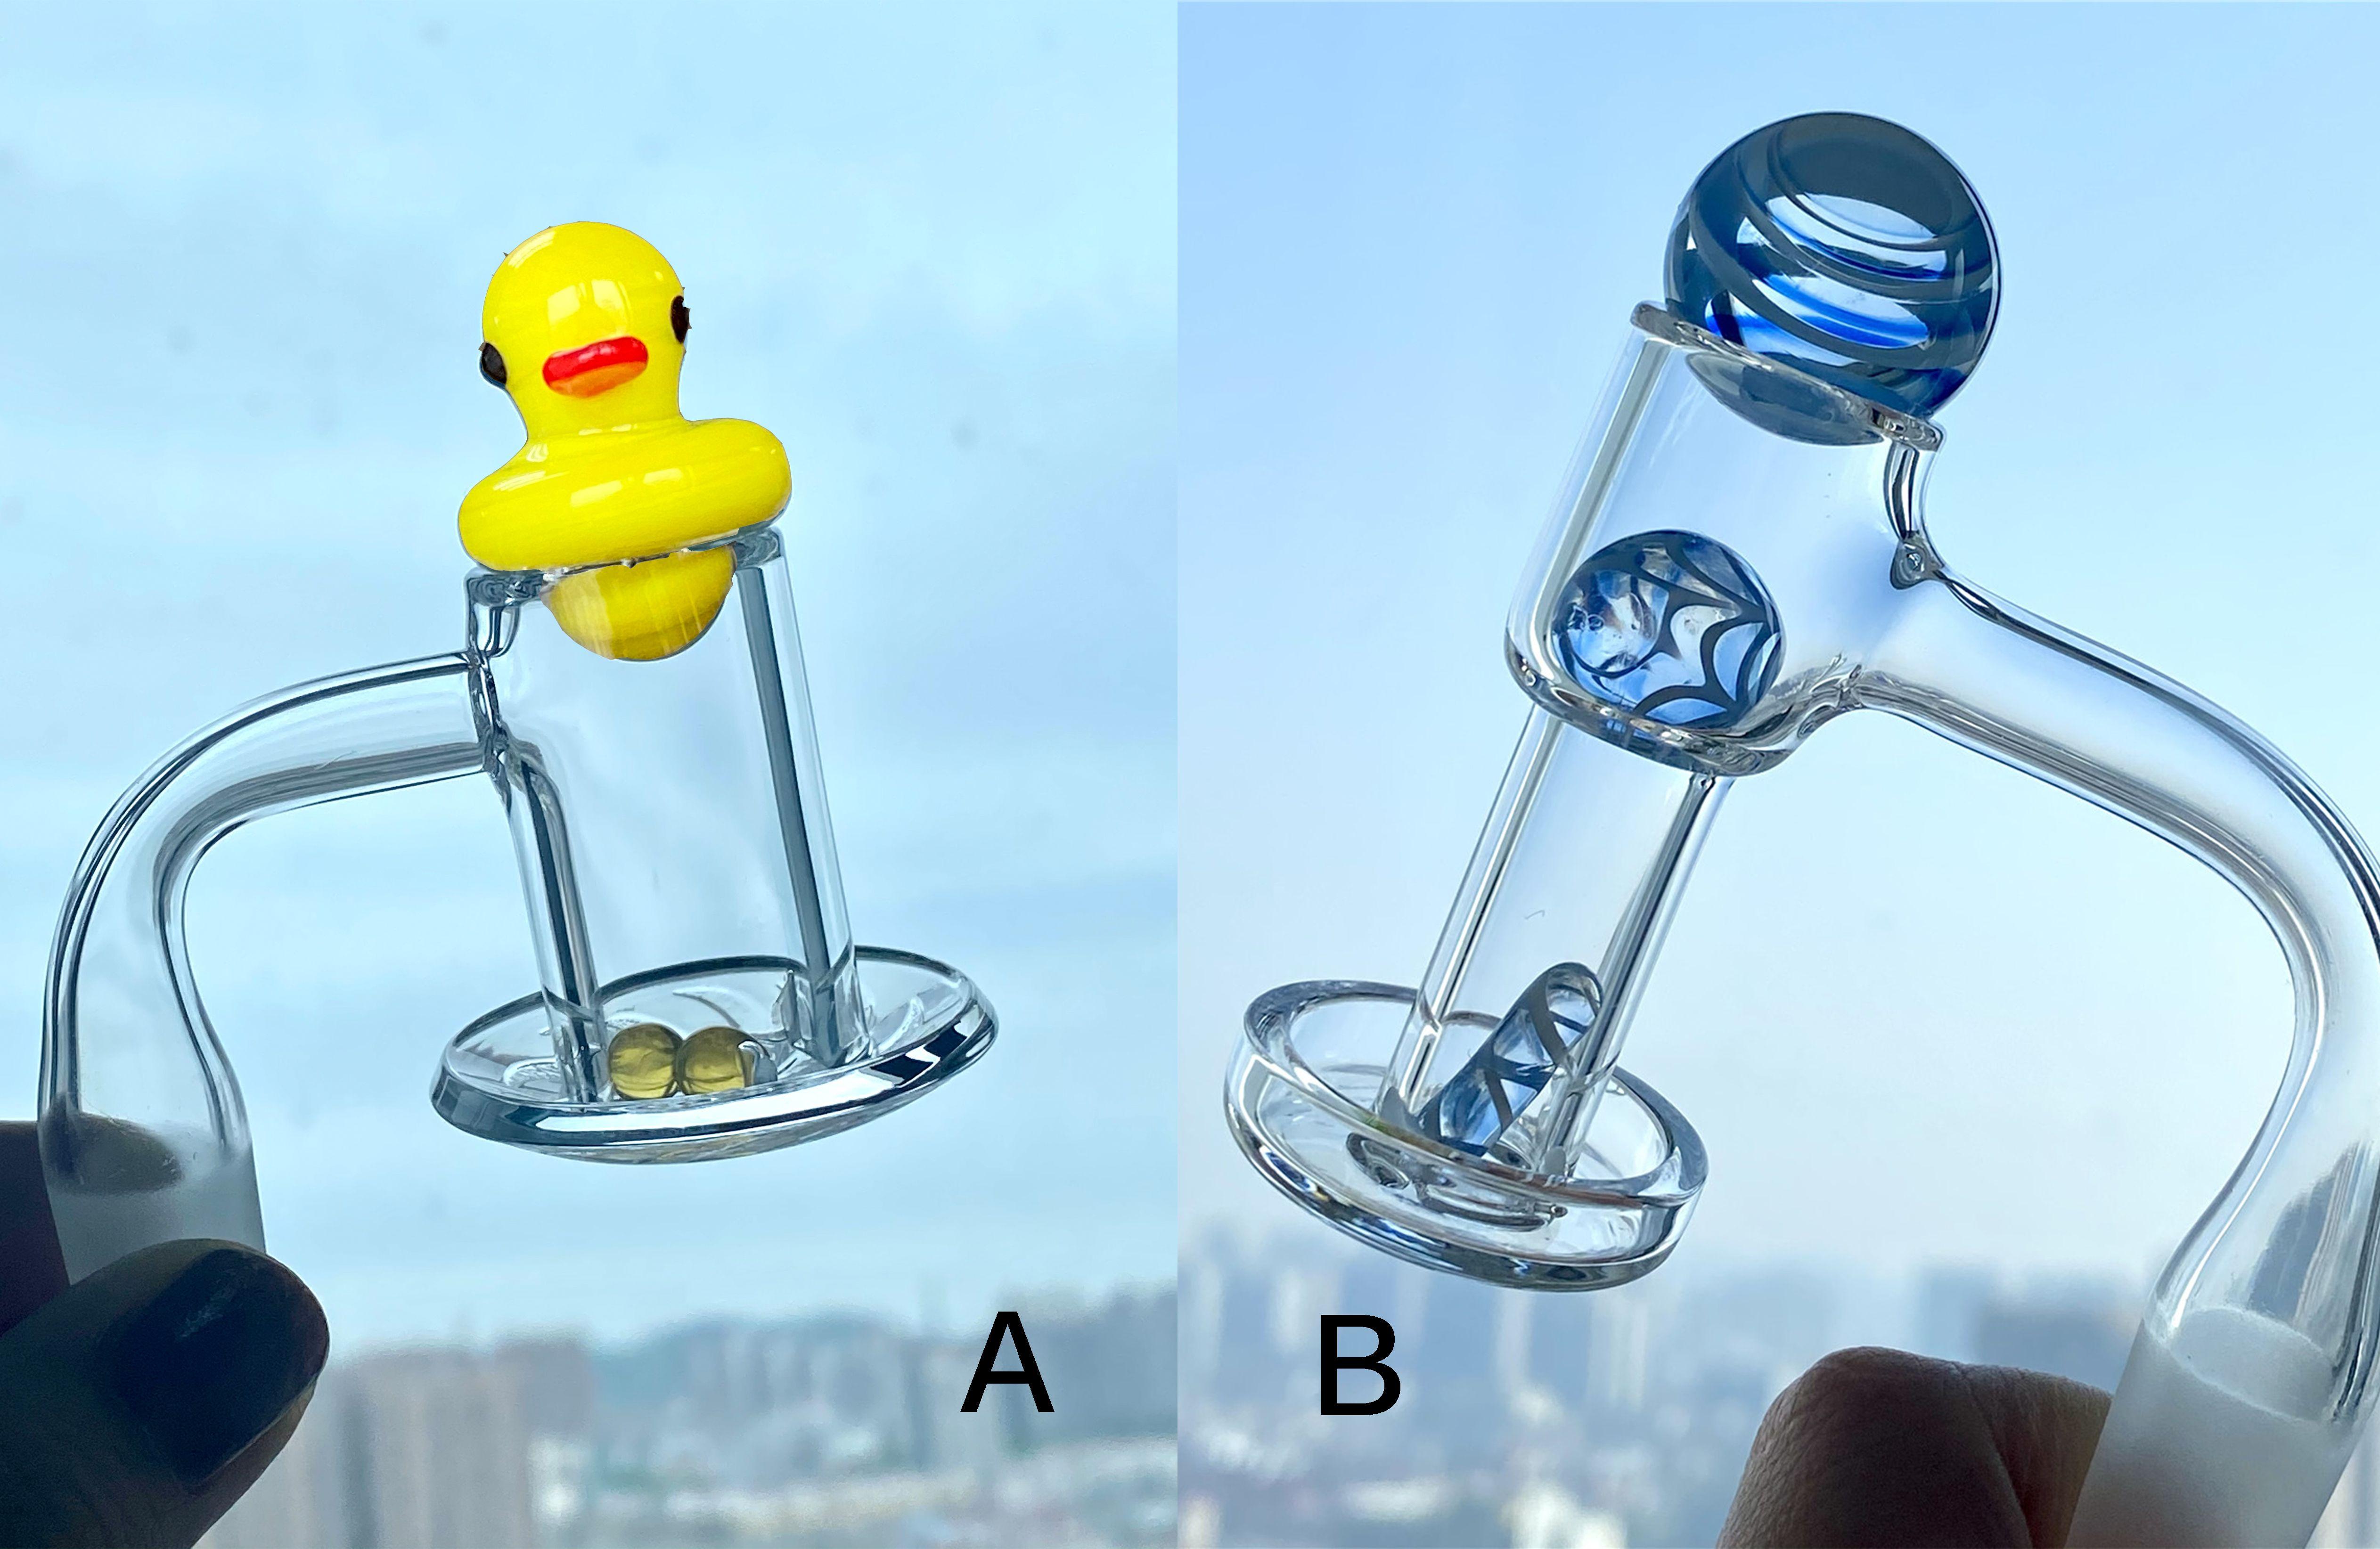 TERP TERP TERP perle quarzo quarzo Banger Nail Smoke Carb Cap Spinner Set 25mm Palla di marmo per DAB Rigs Glass Bongs